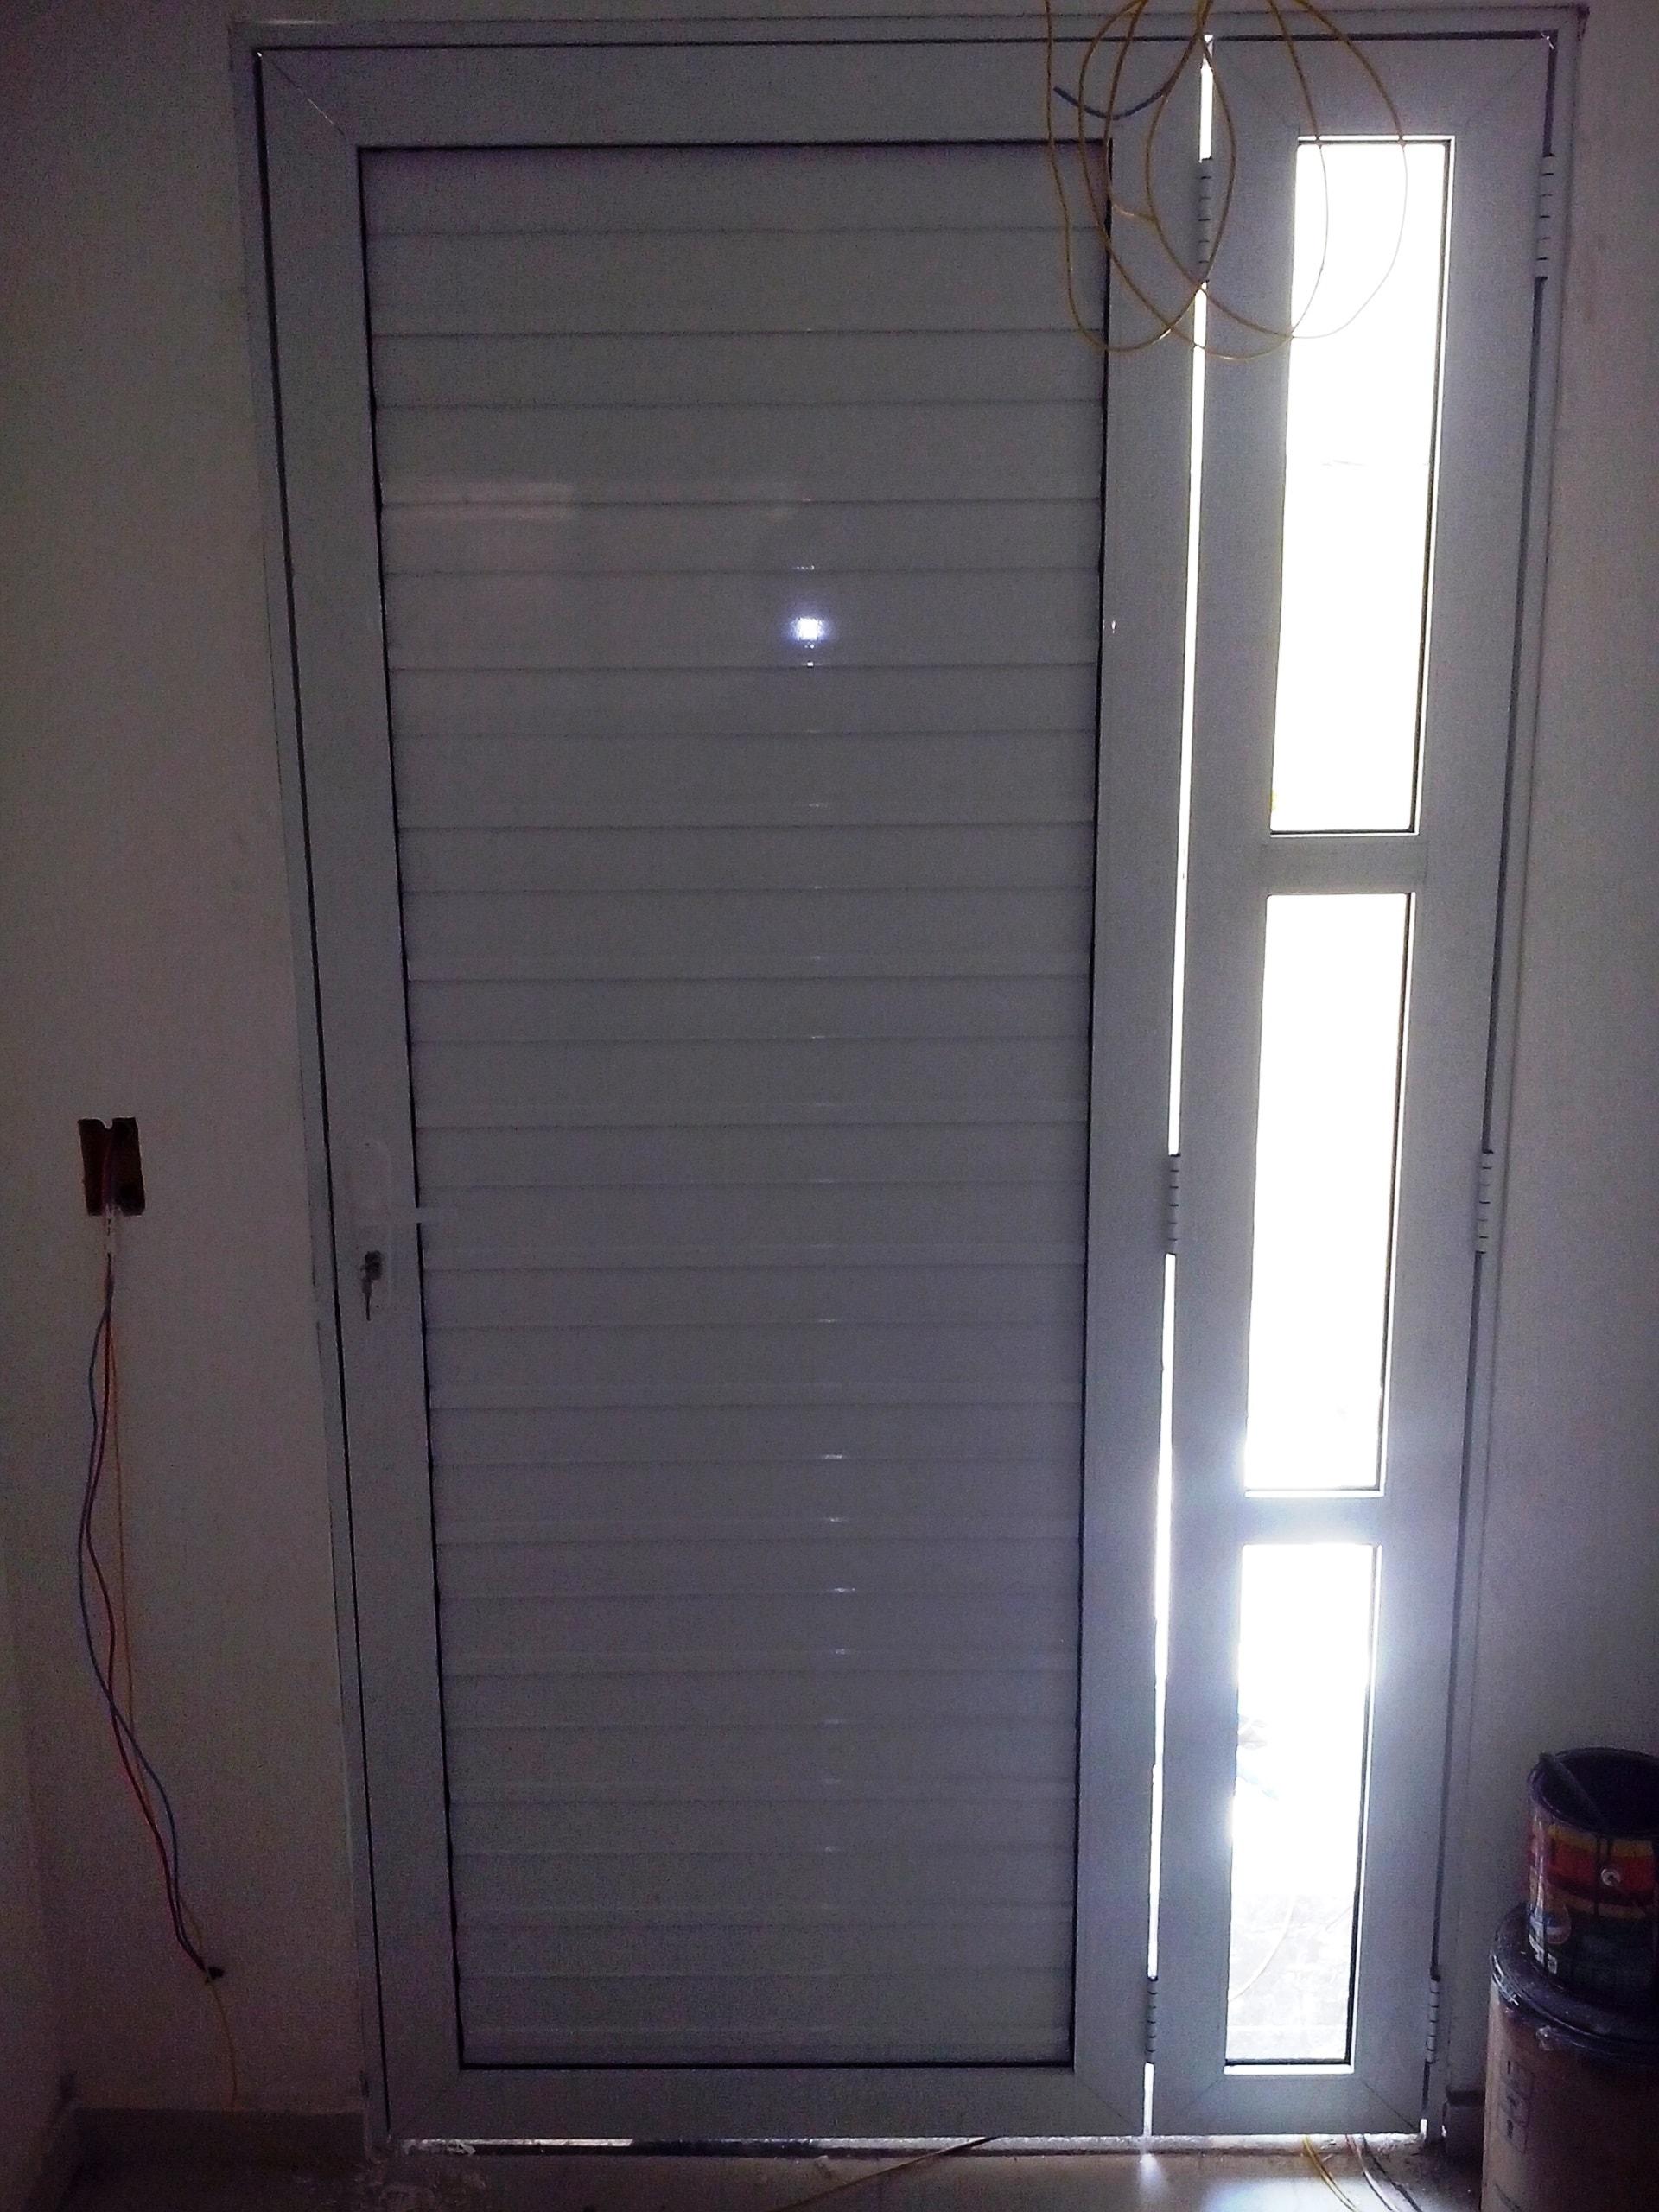 #535E78  Portas de Alumínio na Zona Oeste Janelas e Portas de Alumínio em  844 Manutenção Em Janelas De Aluminio Belo Horizonte